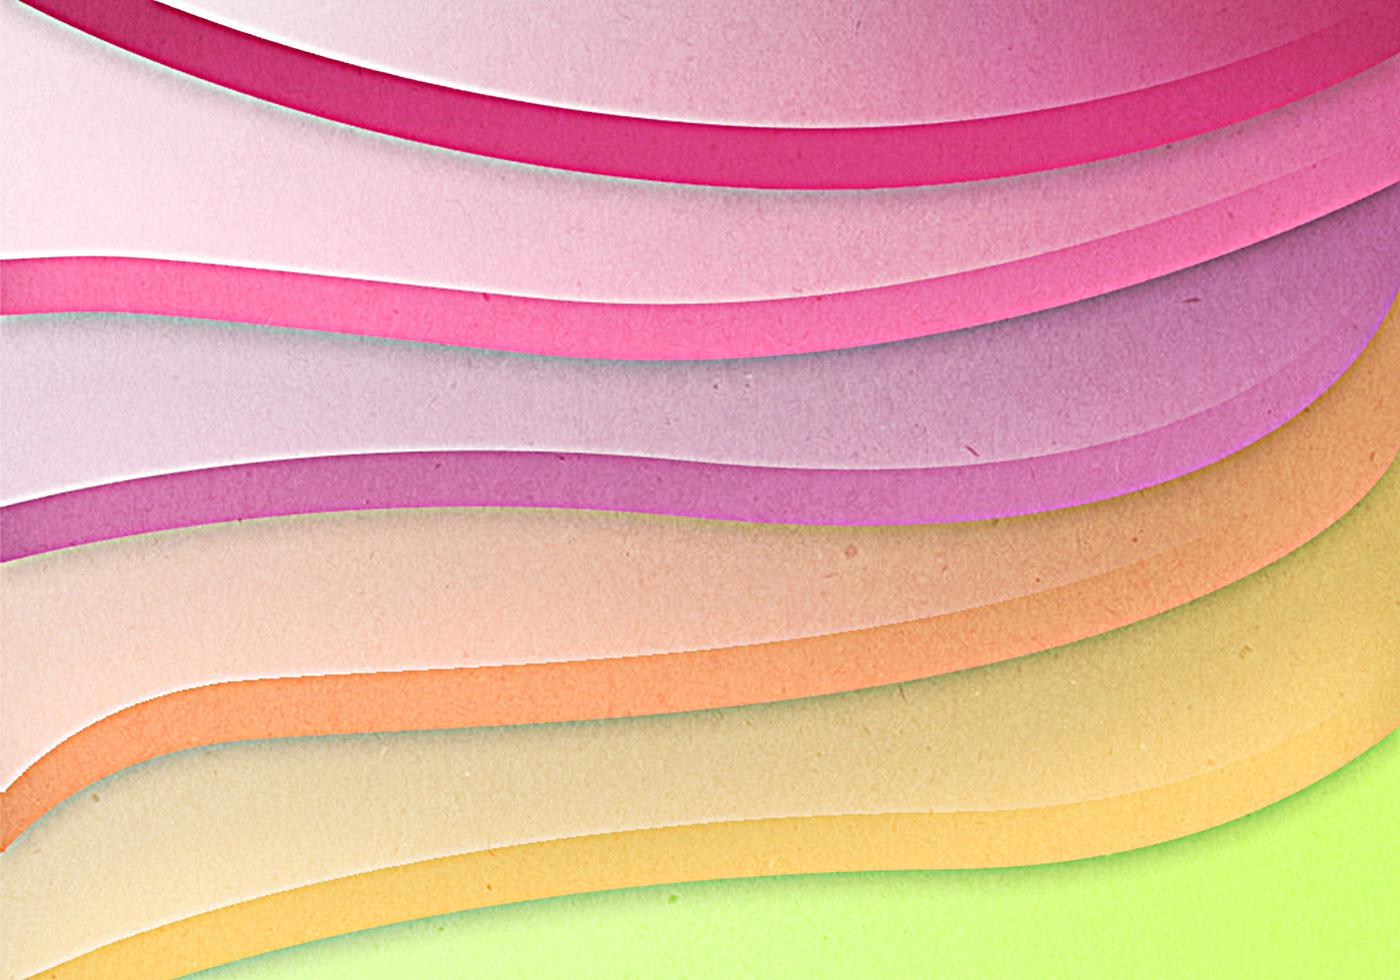 Color Wave Free Photoshop Brushes At Brusheezy